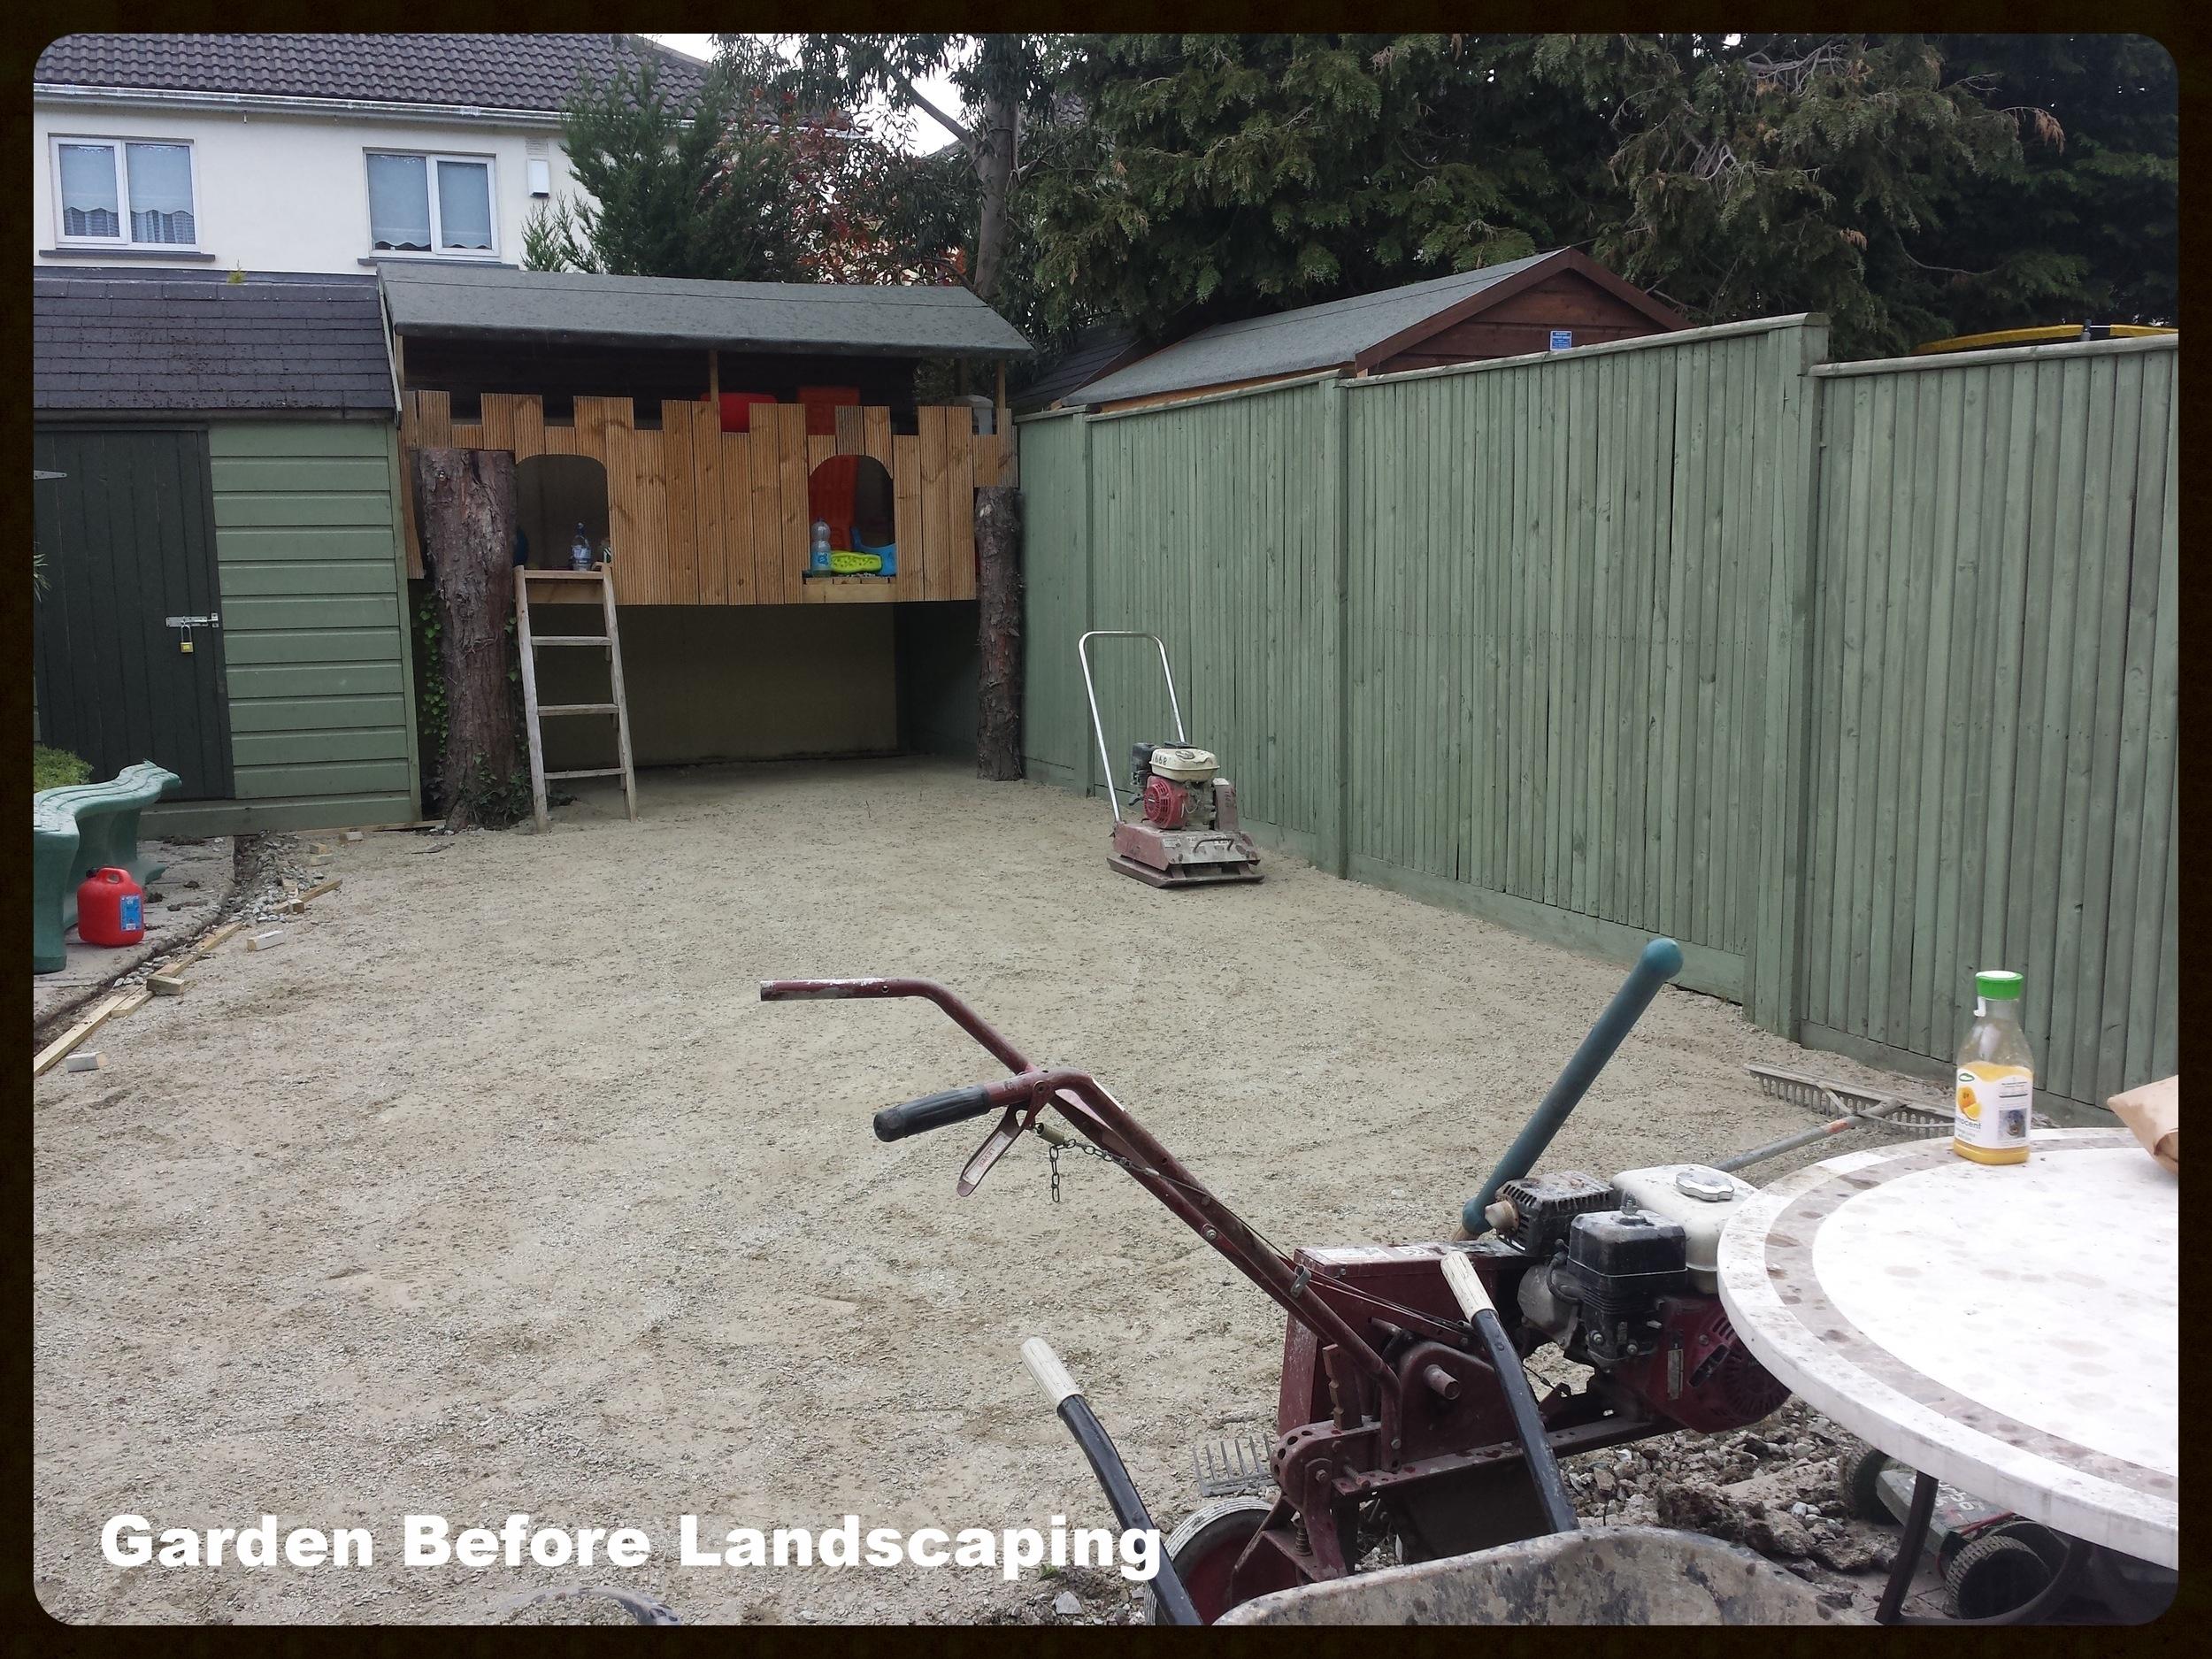 Garden Landscaping with artificial grass